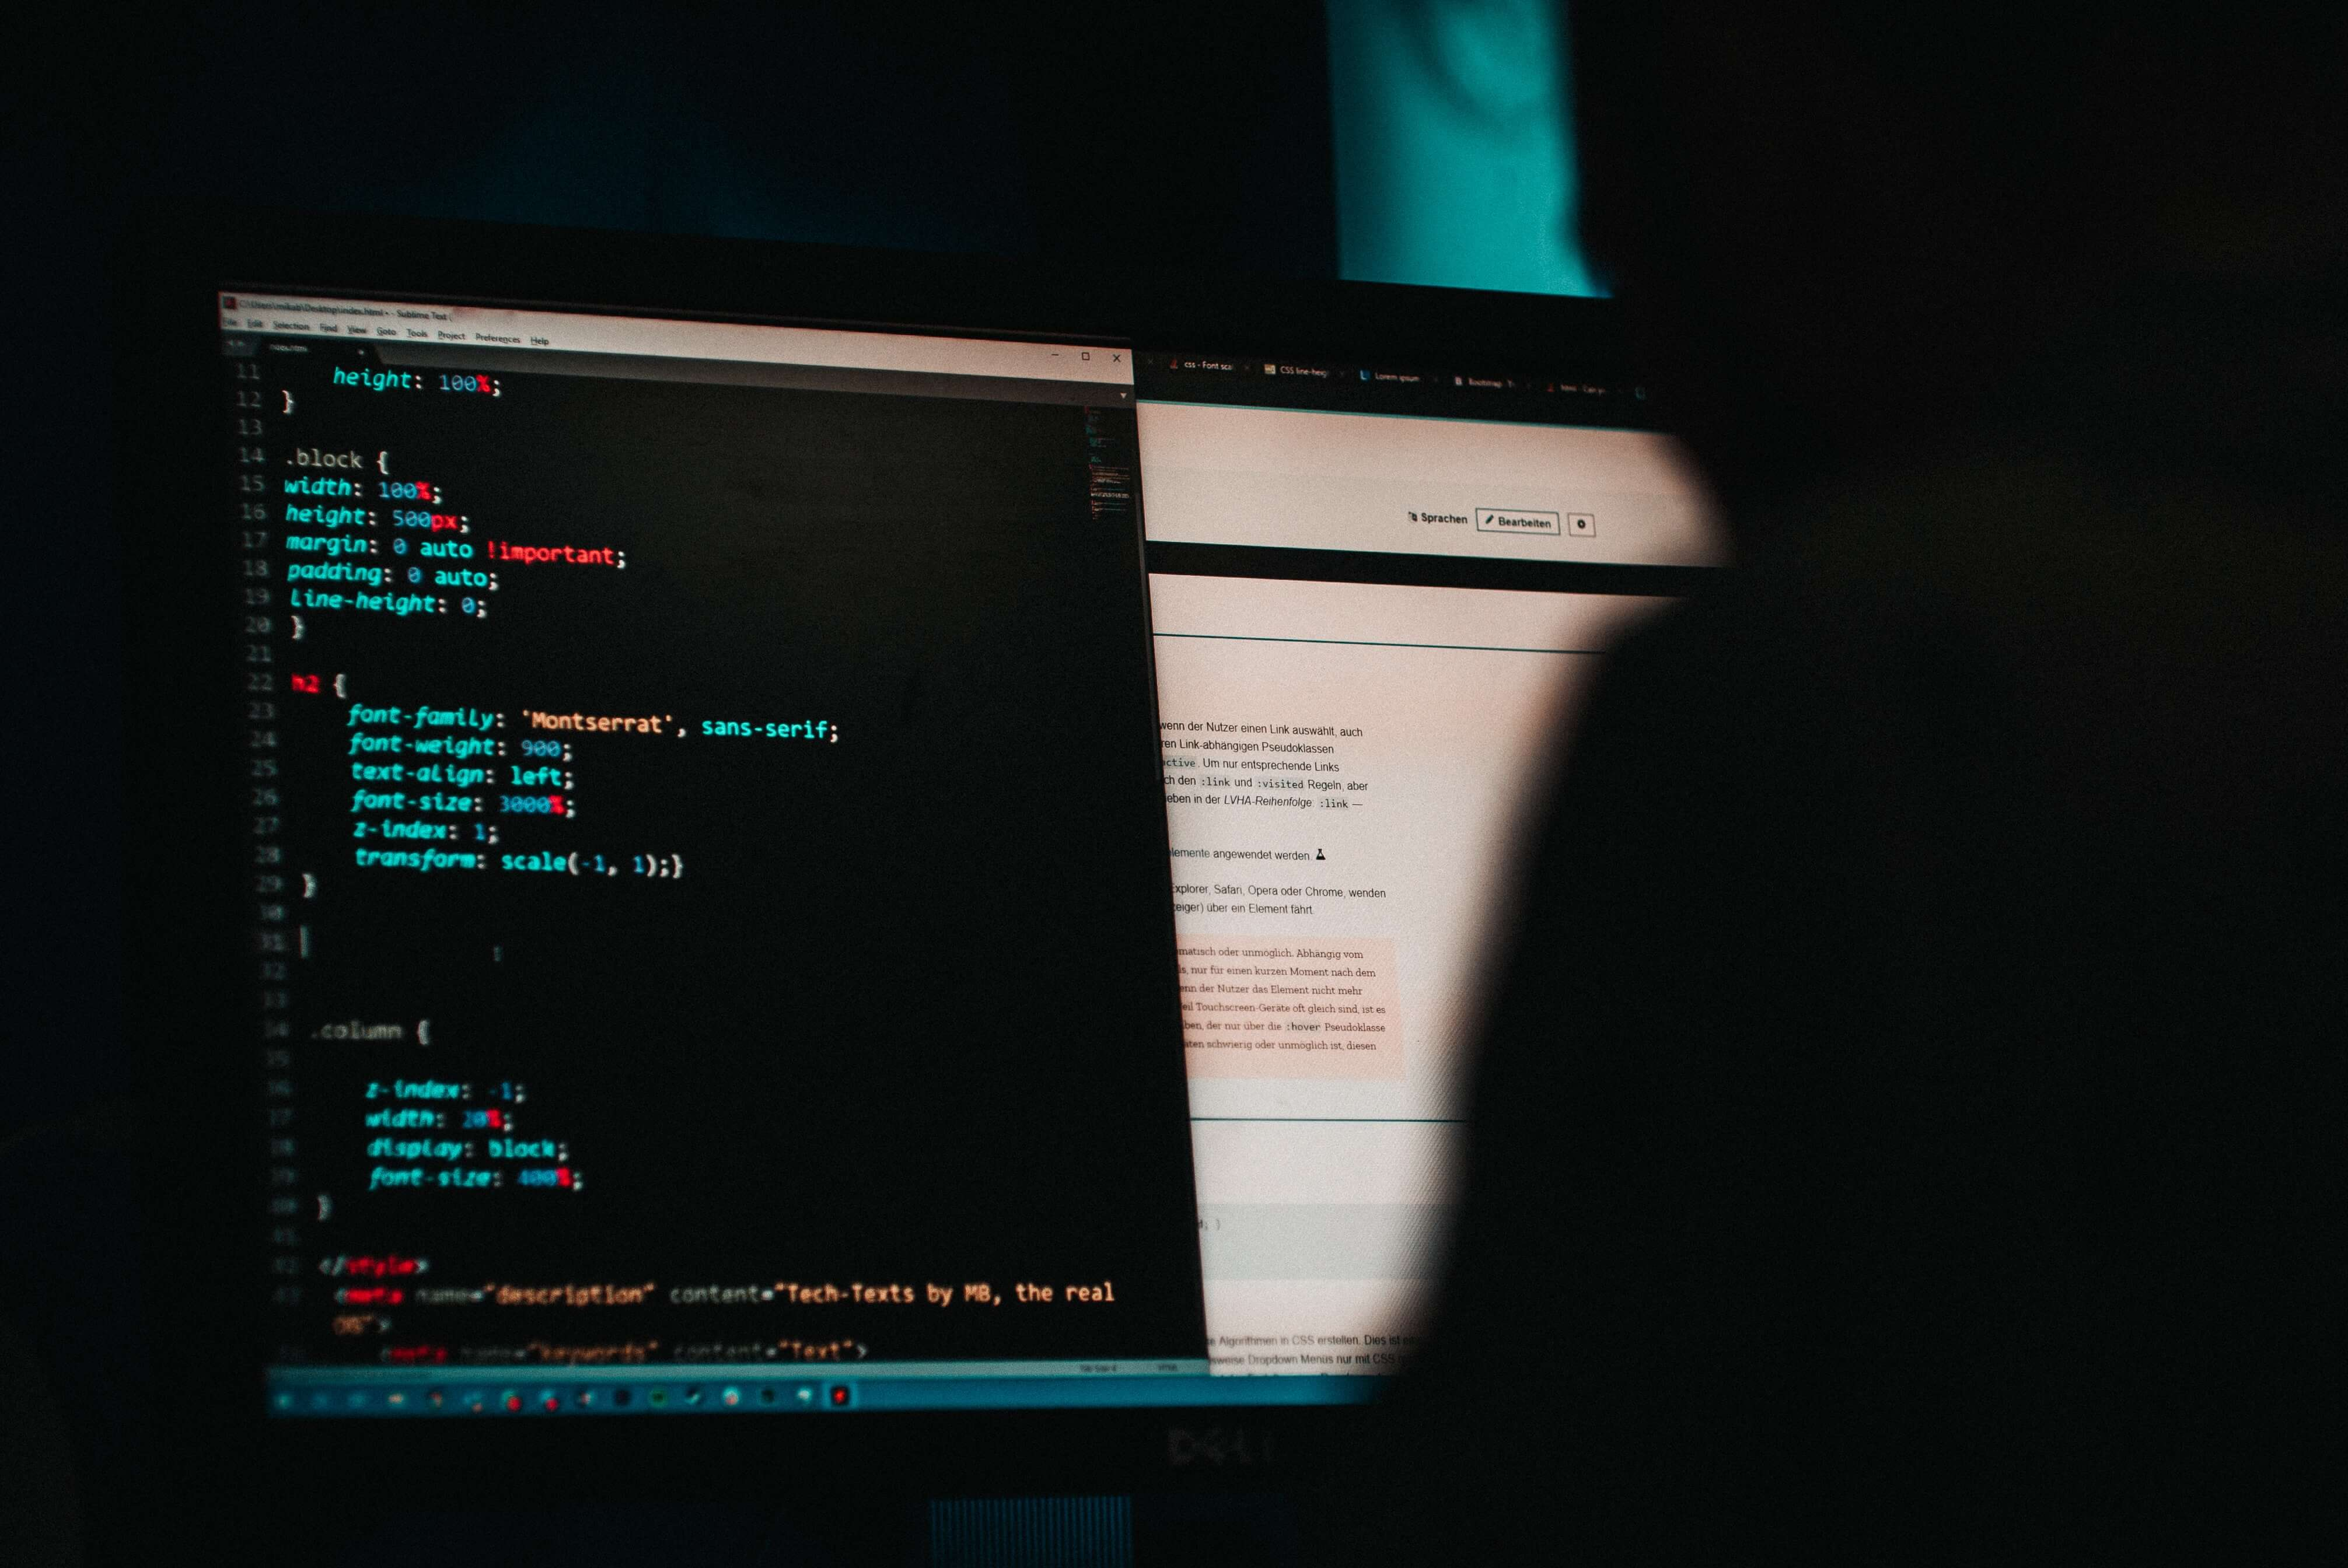 Hacker looking at a computer screen